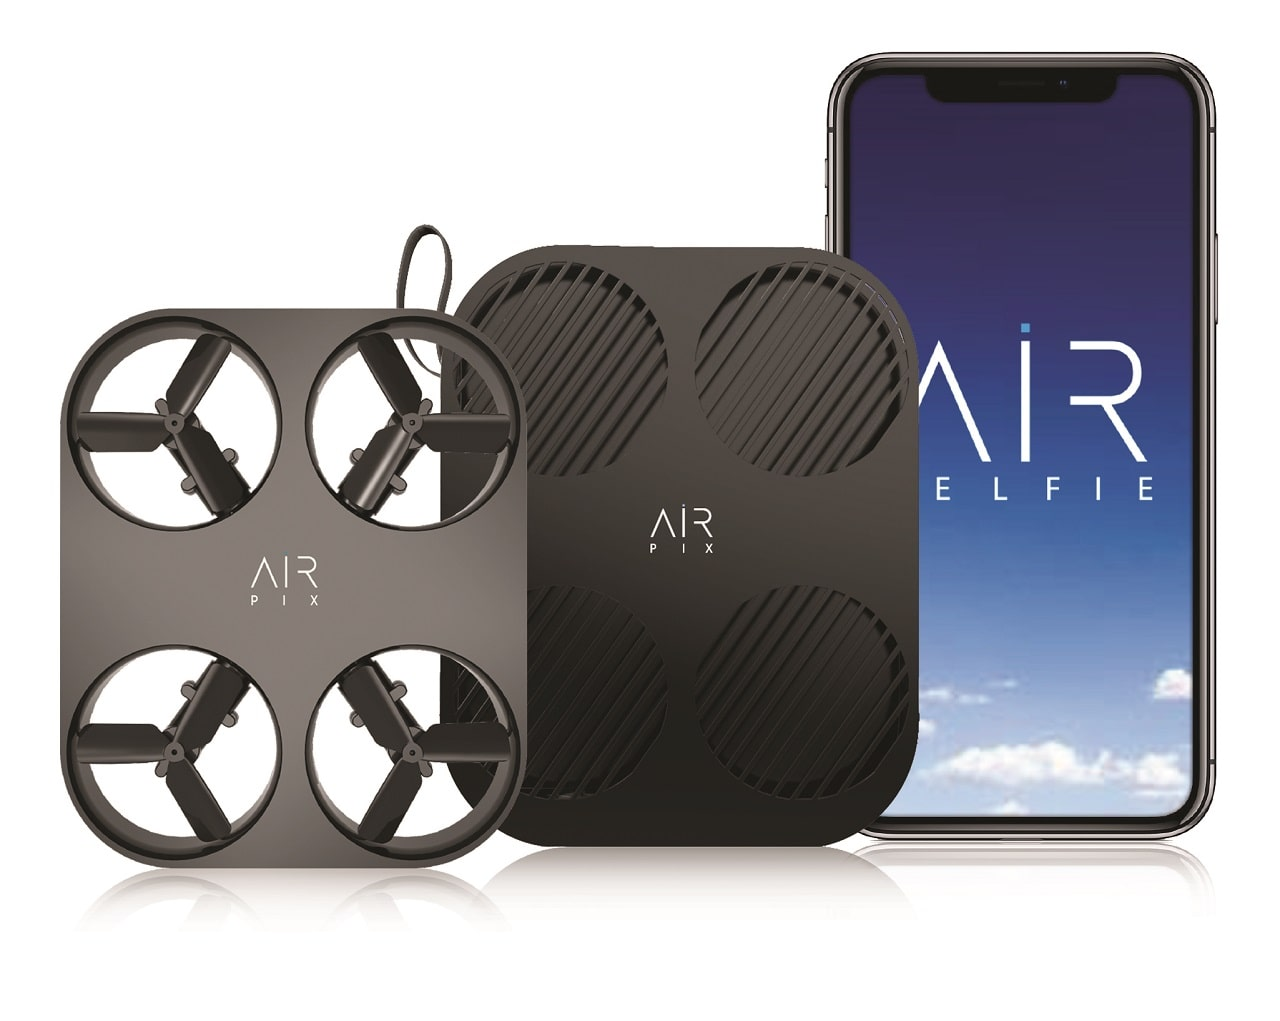 droni tascabili airselfie